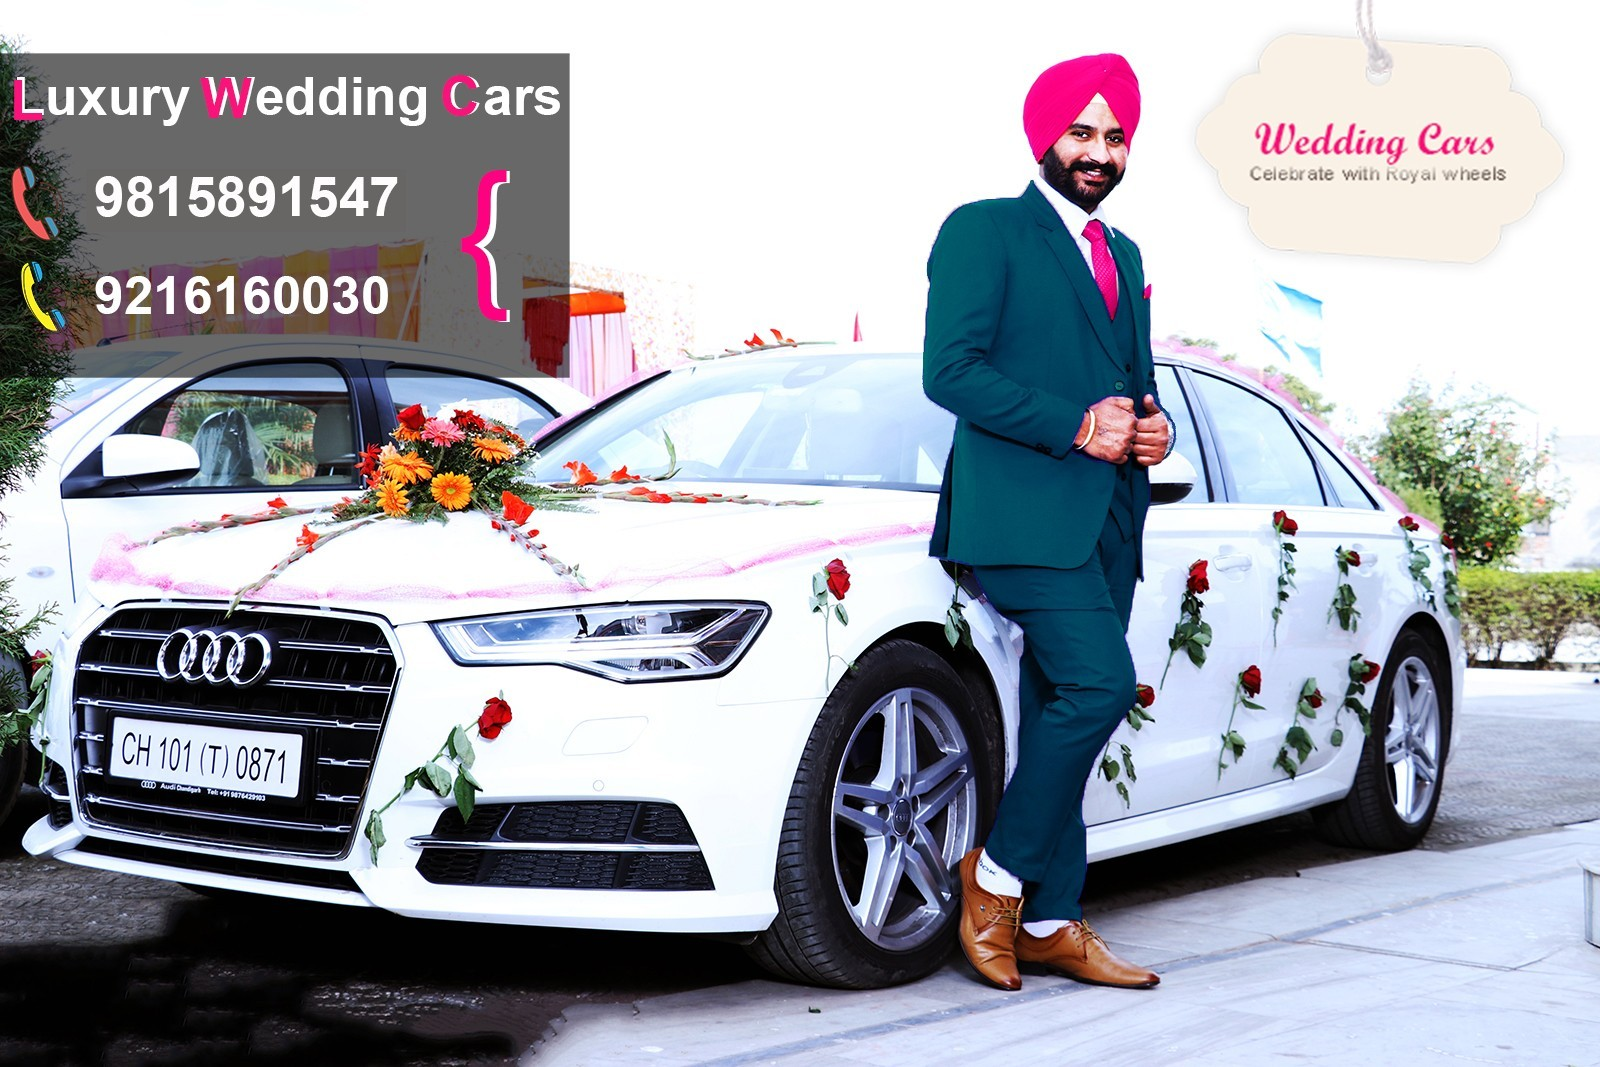 Hire Wedding Audi car Audi For doli in Chandigarh, Audi For Doli In Mohali, Wedding Audi car